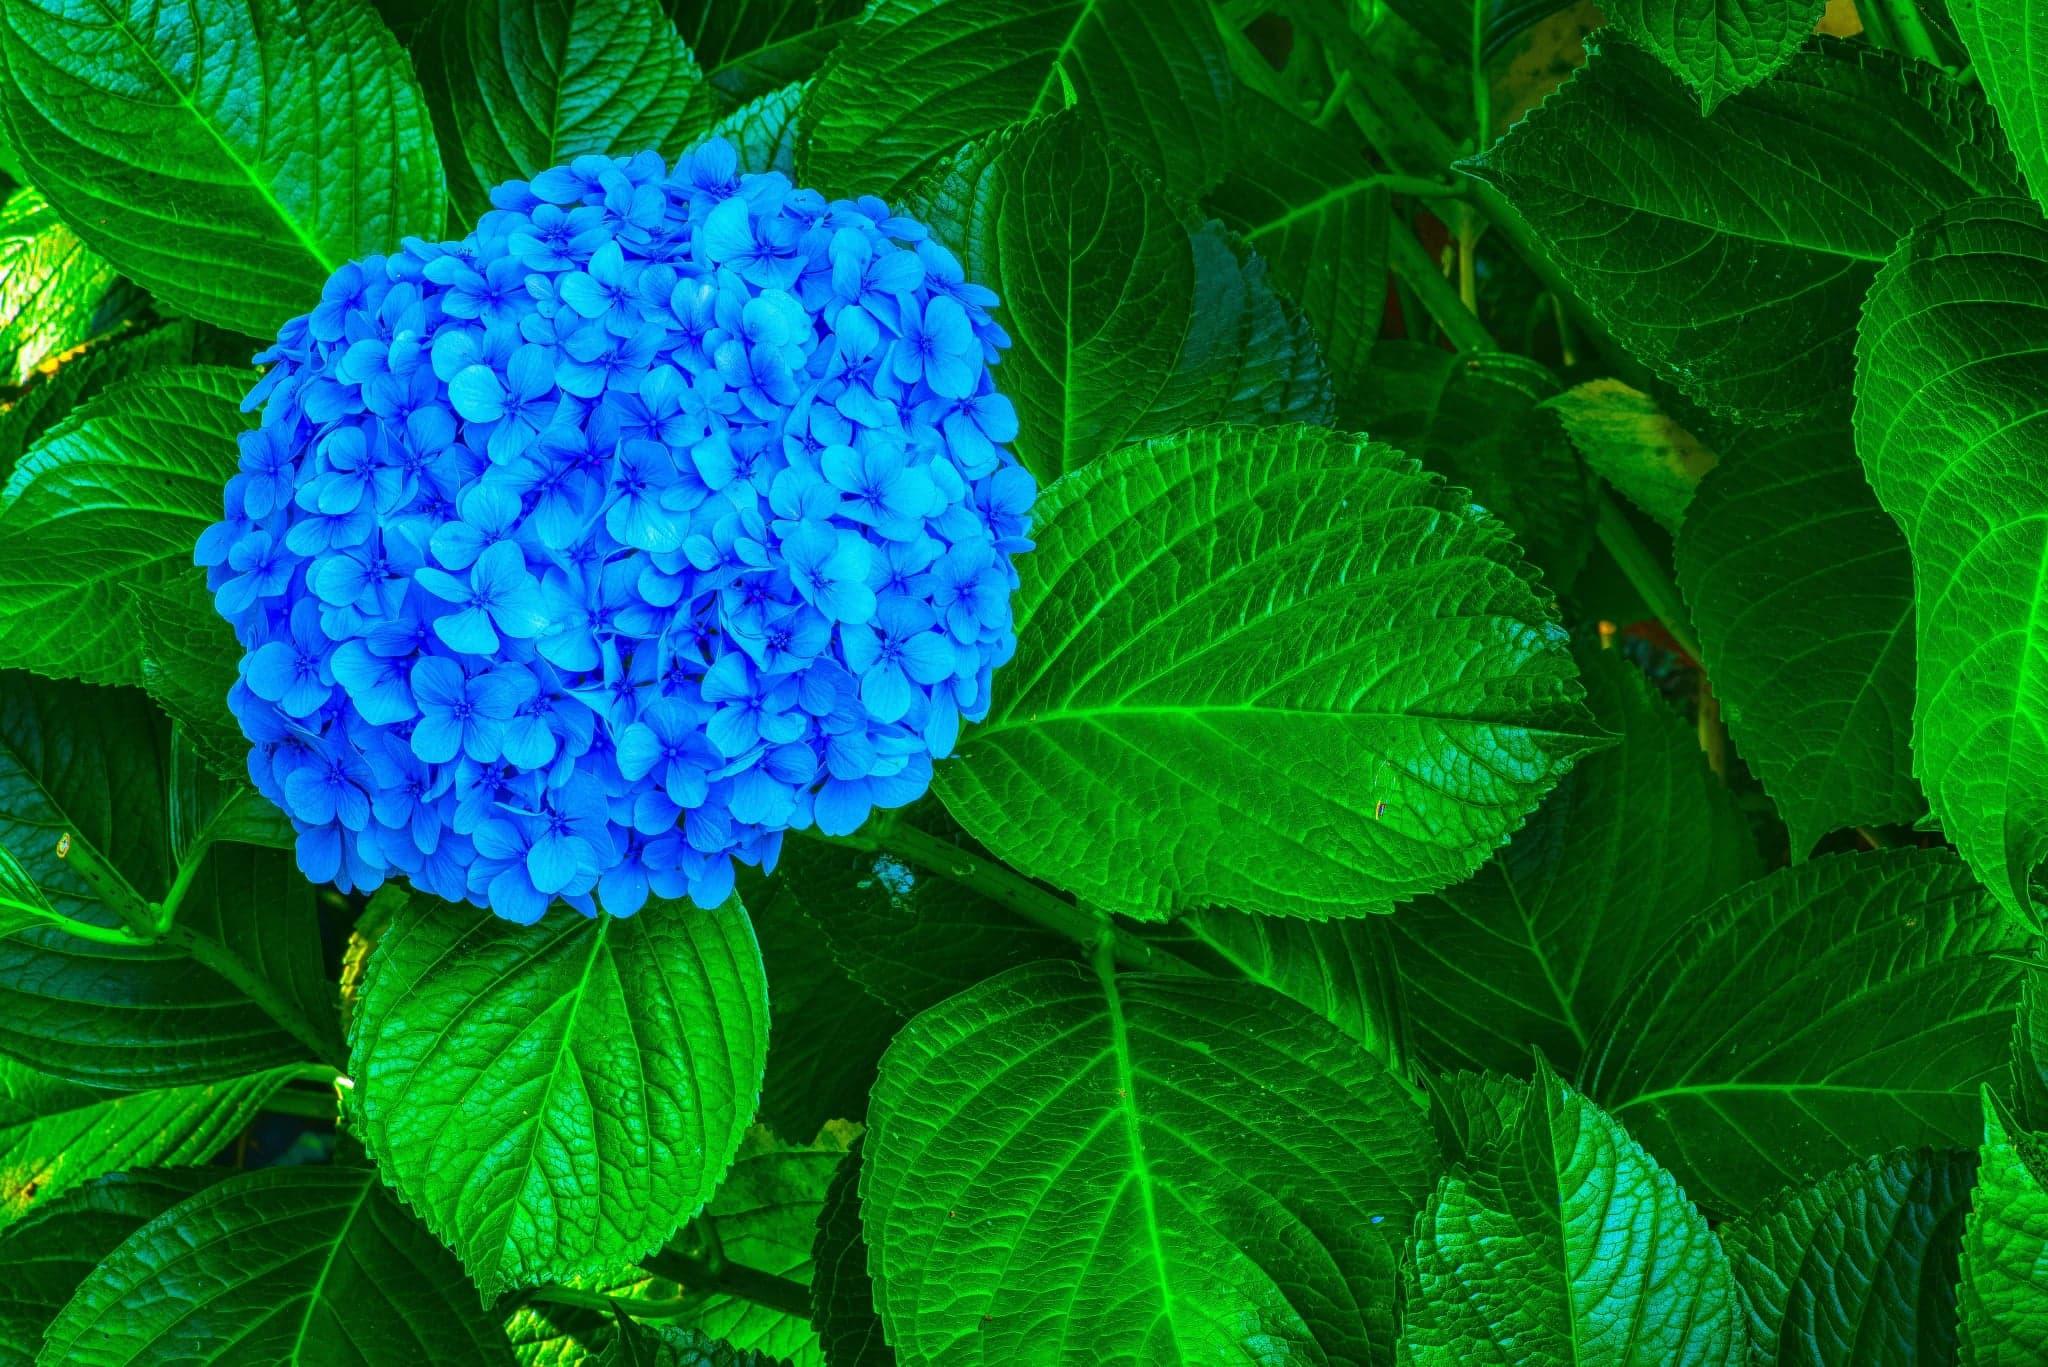 Blue Hydrangea from the Azores Island on Faial Island